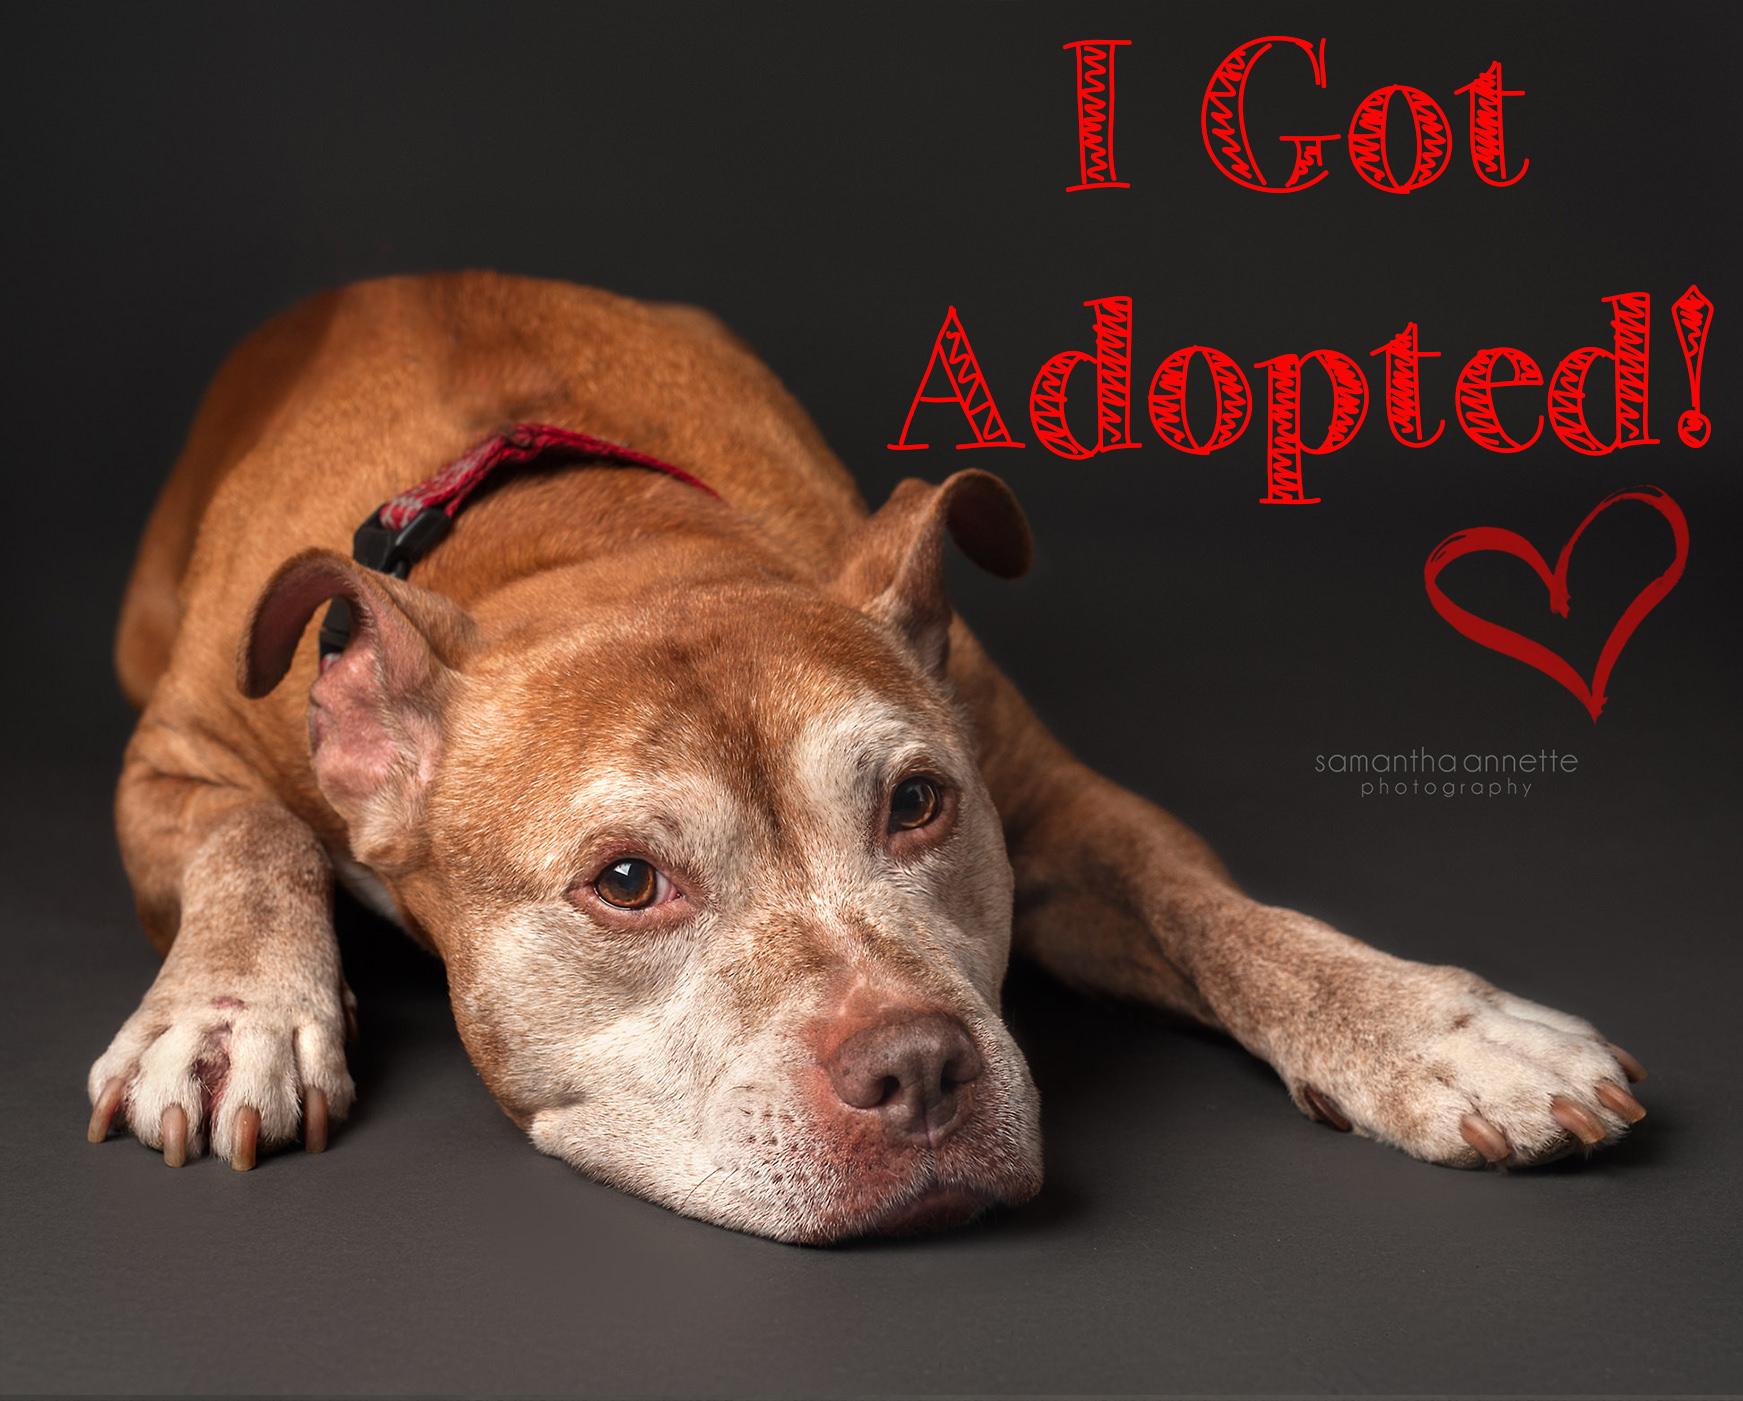 deisel got adopted.jpg